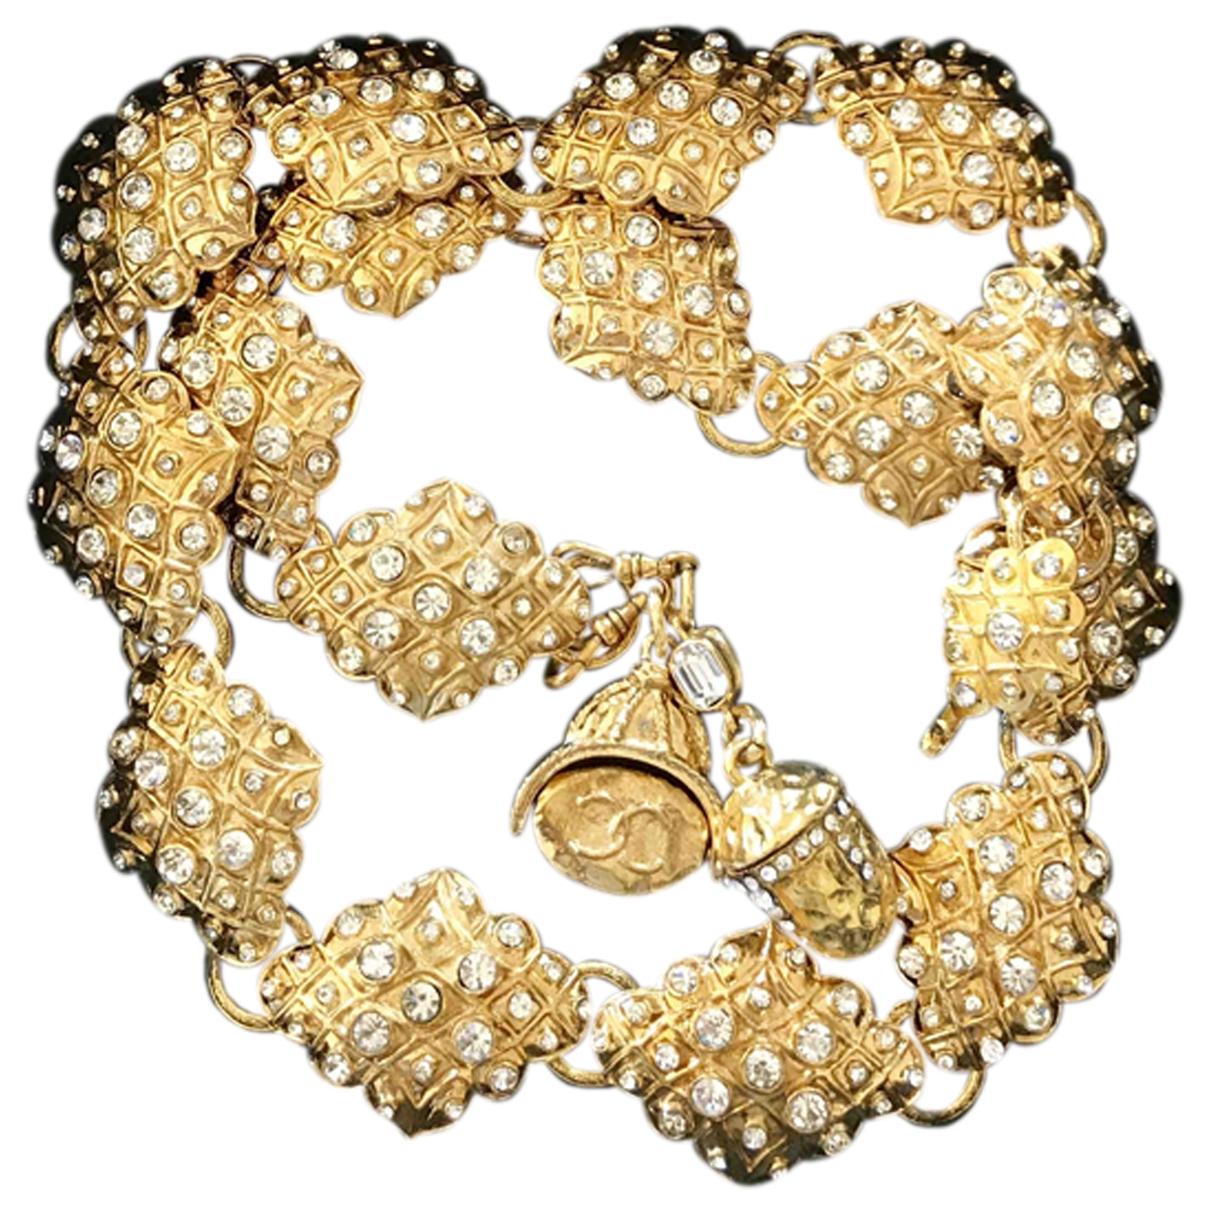 Chanel \N Gold Metal belt for Women 75 cm